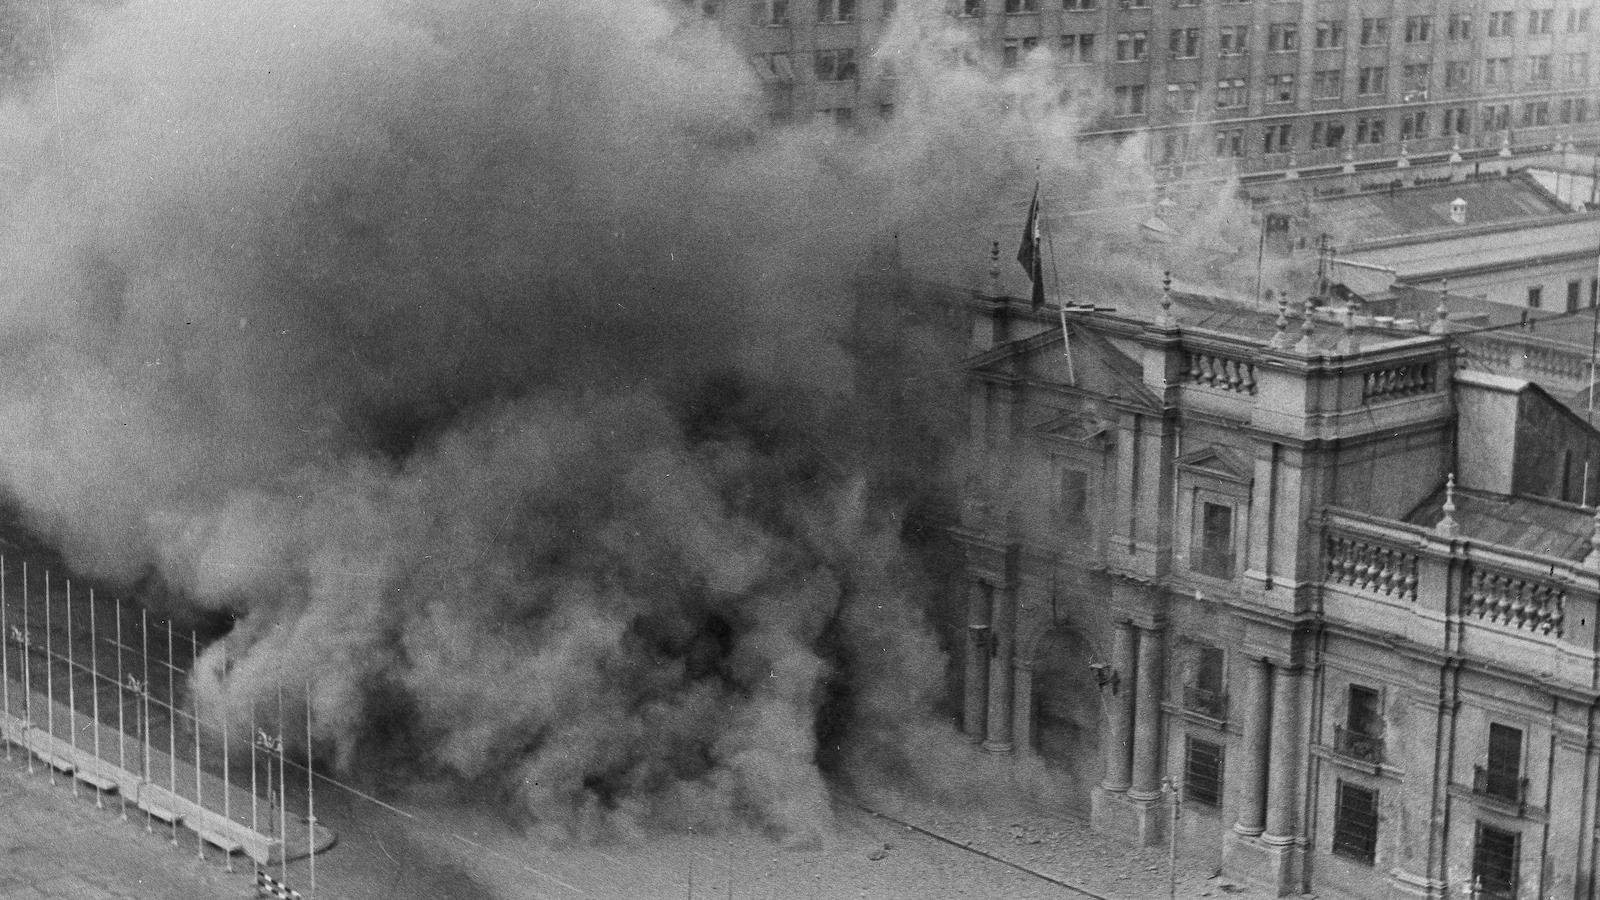 histo-palais-presidentiel-bombardement